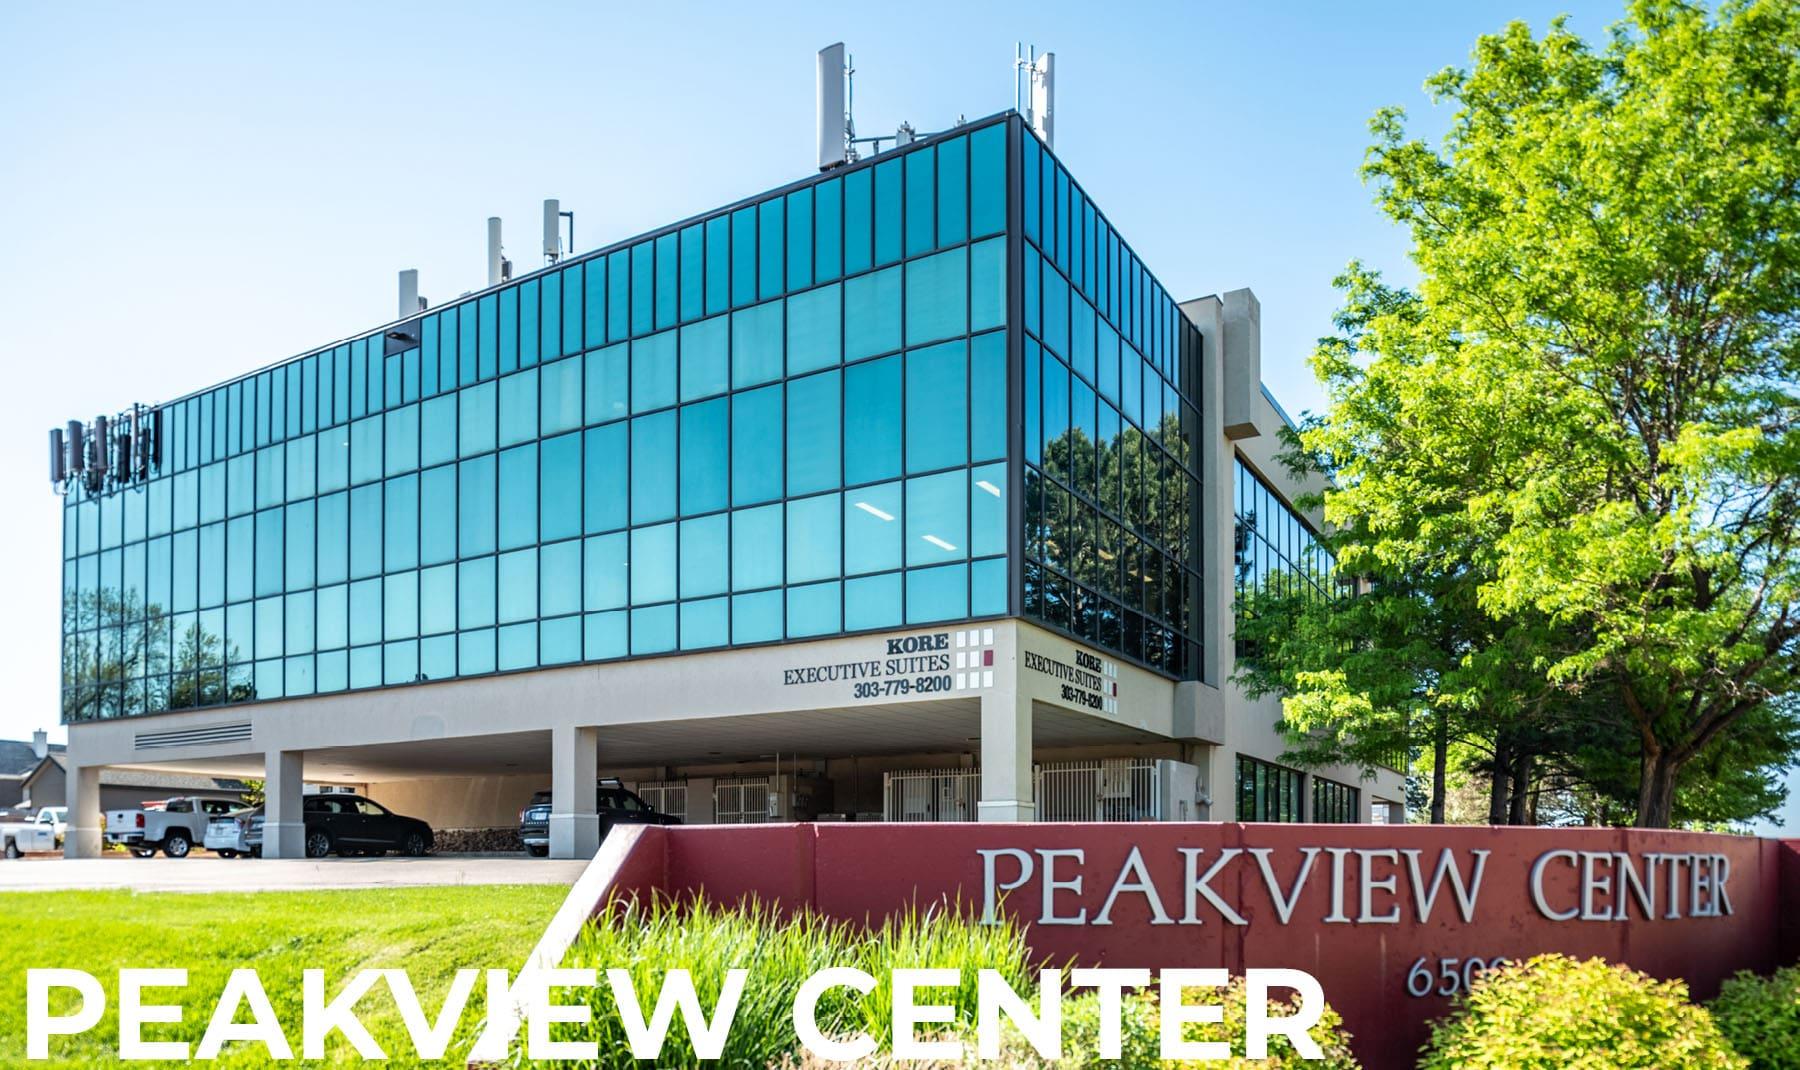 PEAKVIEW CENTER GREENWOOD VILLAGE, CO